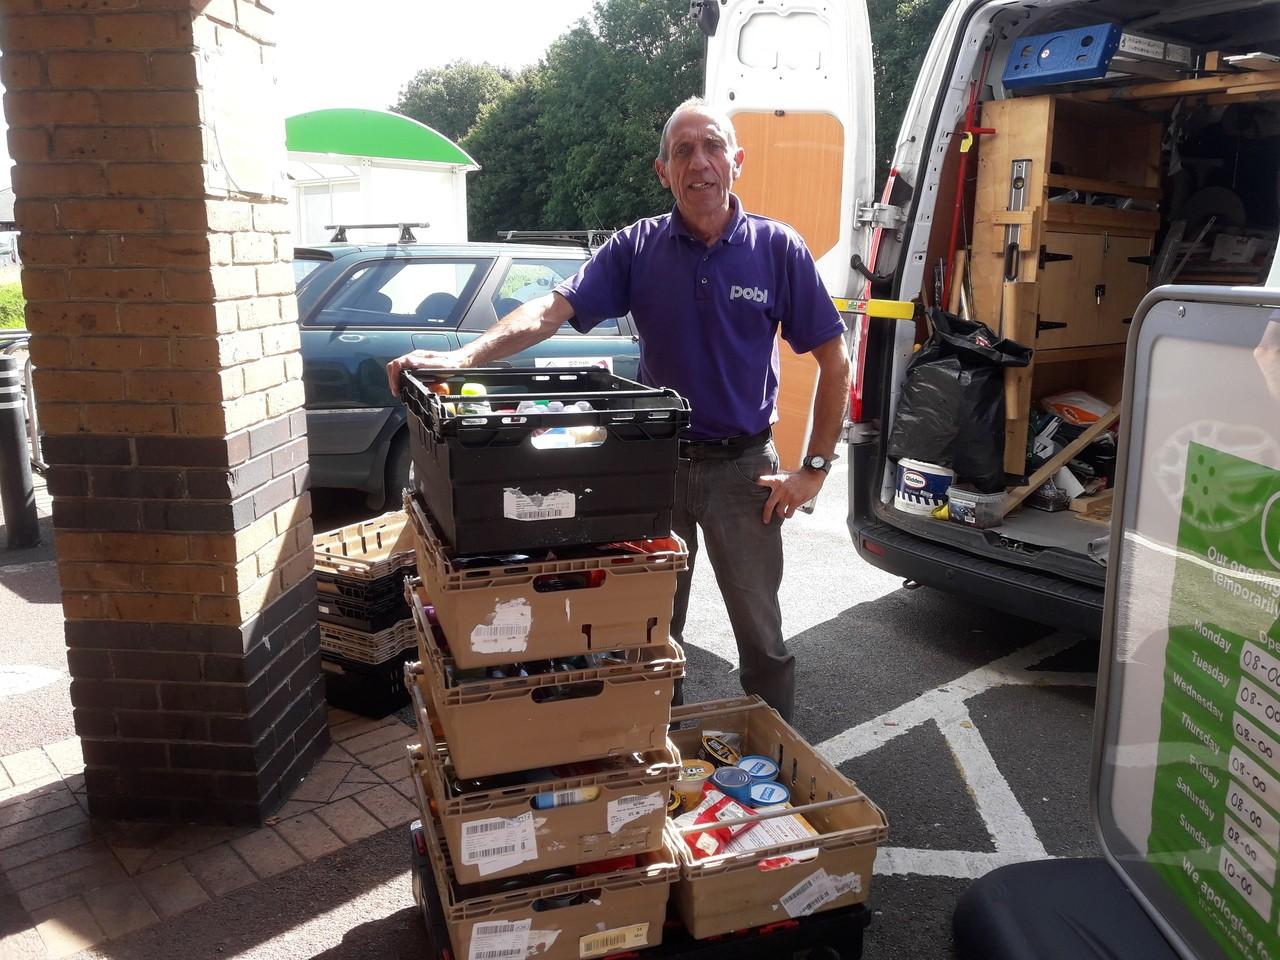 Collection for Newport Foodbank | Asda Newport